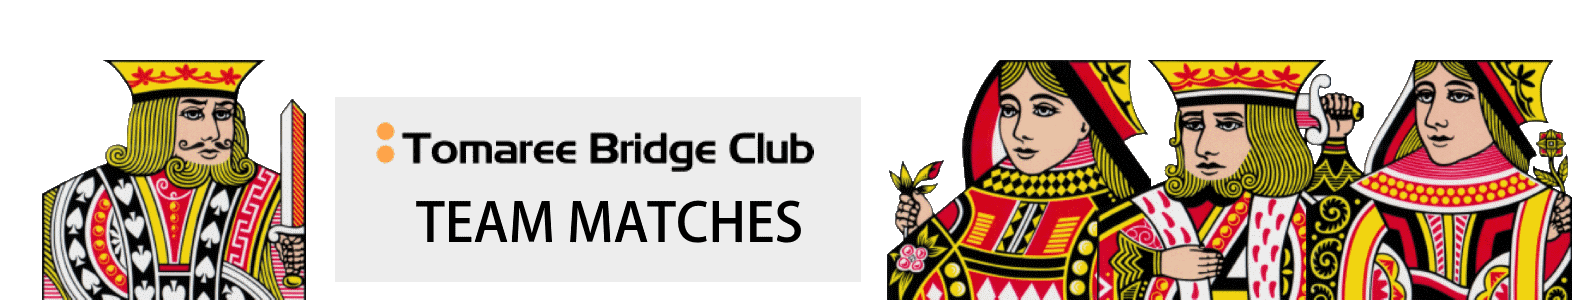 Tomaree Bridge Club teams event results